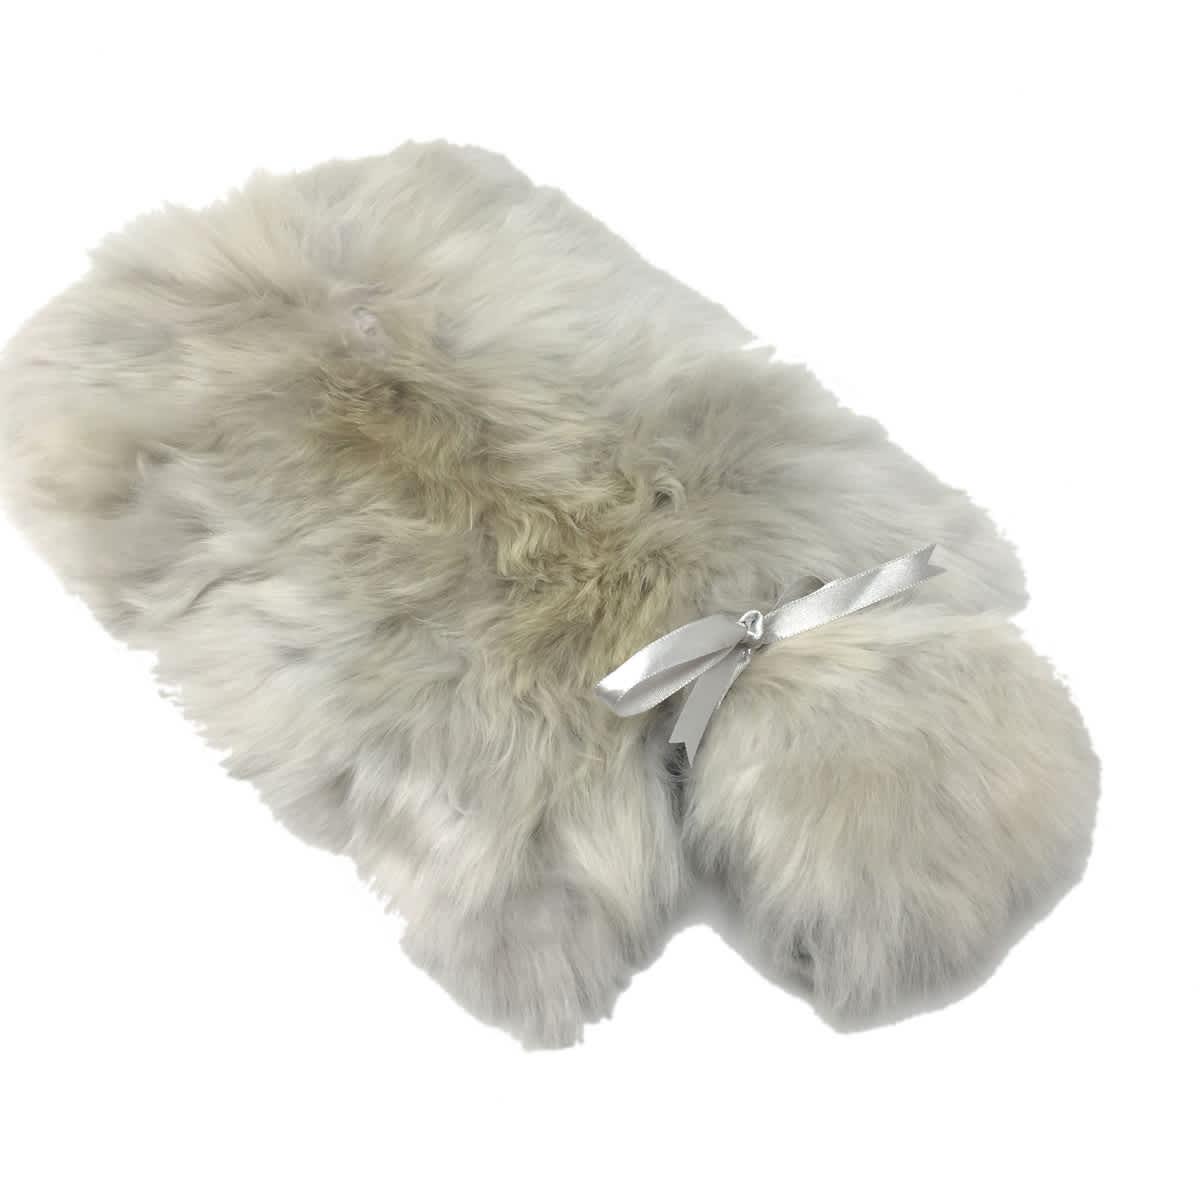 Samantha Holmes Alpaca Fur Hot Water Bottle